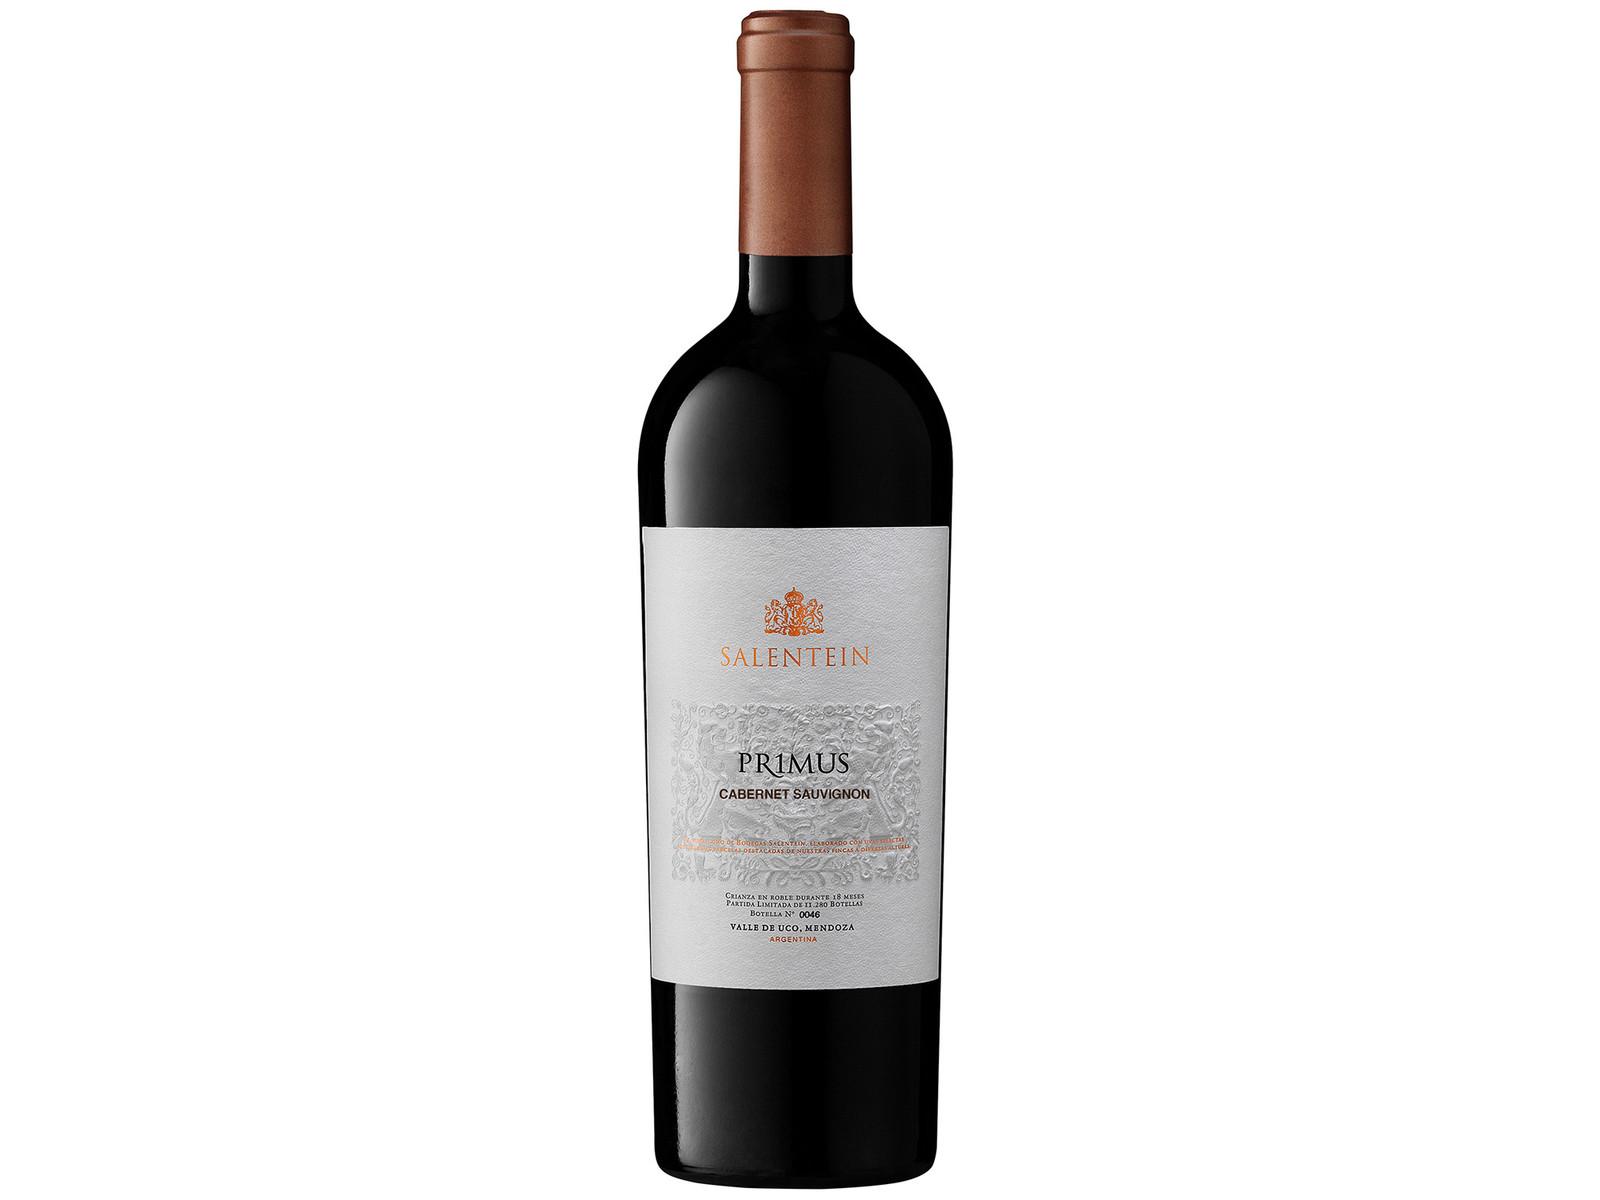 Bodegas Salentein Salentein / Primus / Cabernet Sauvignon